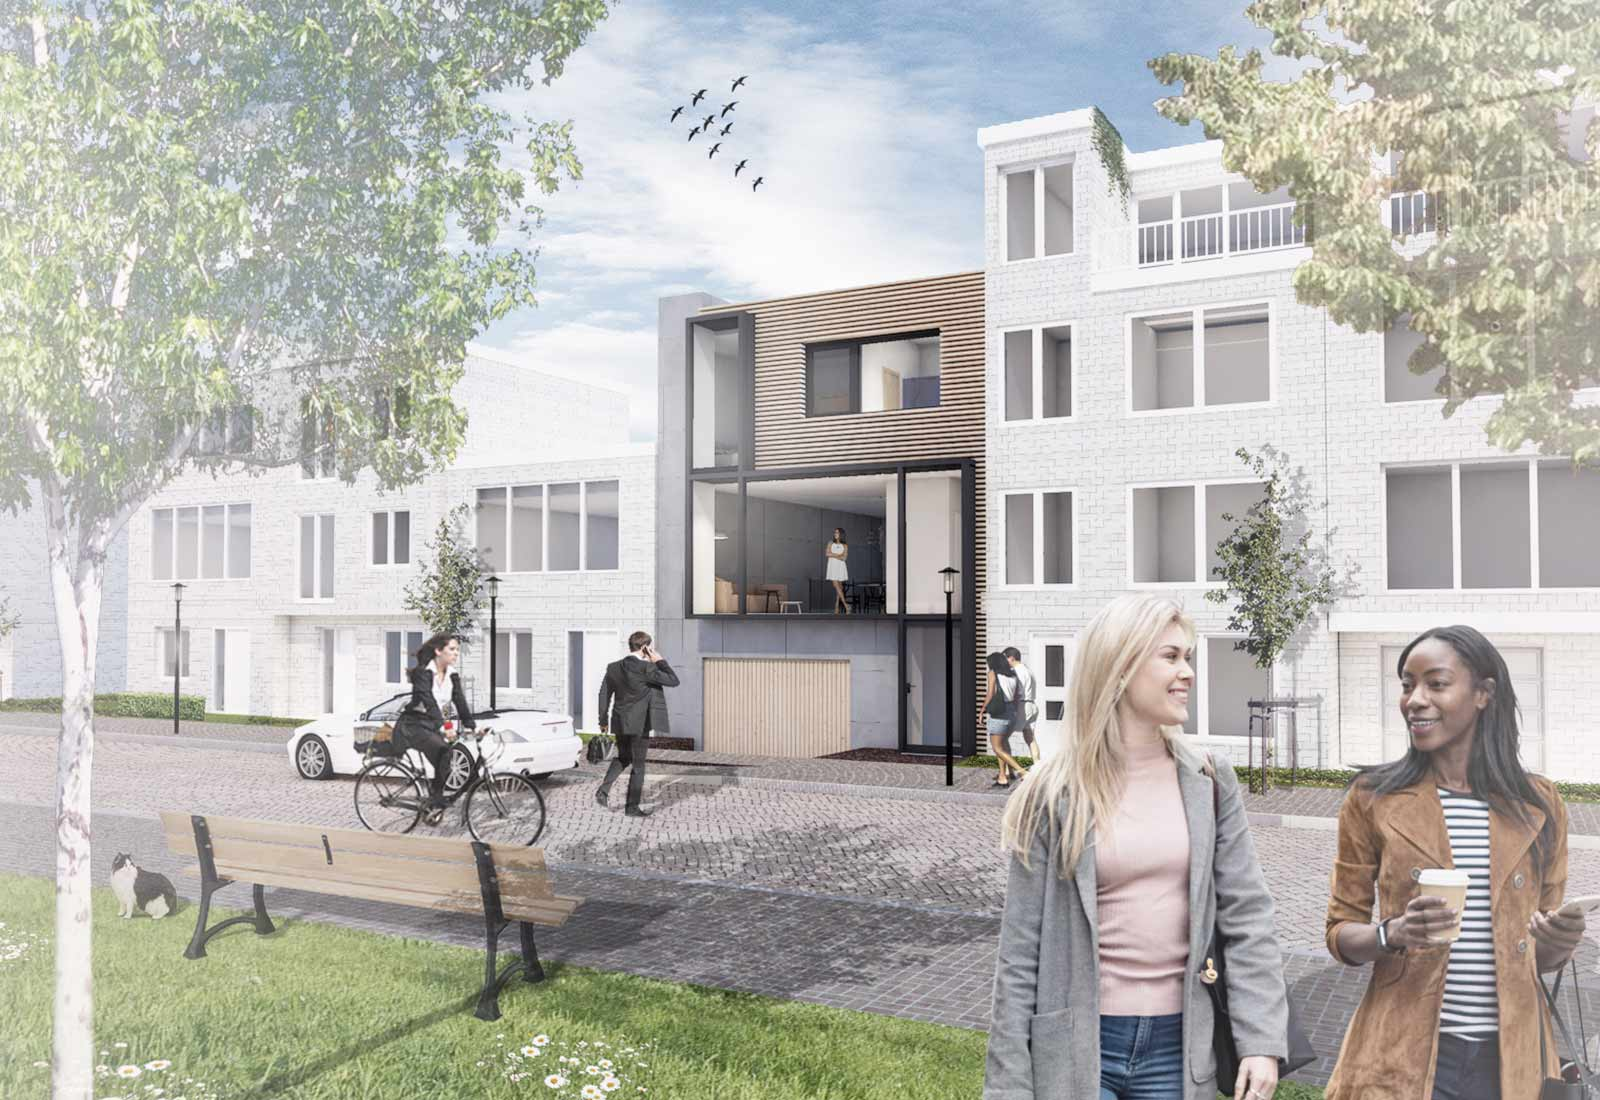 Architect Den Haag Zelfbouw woning 18